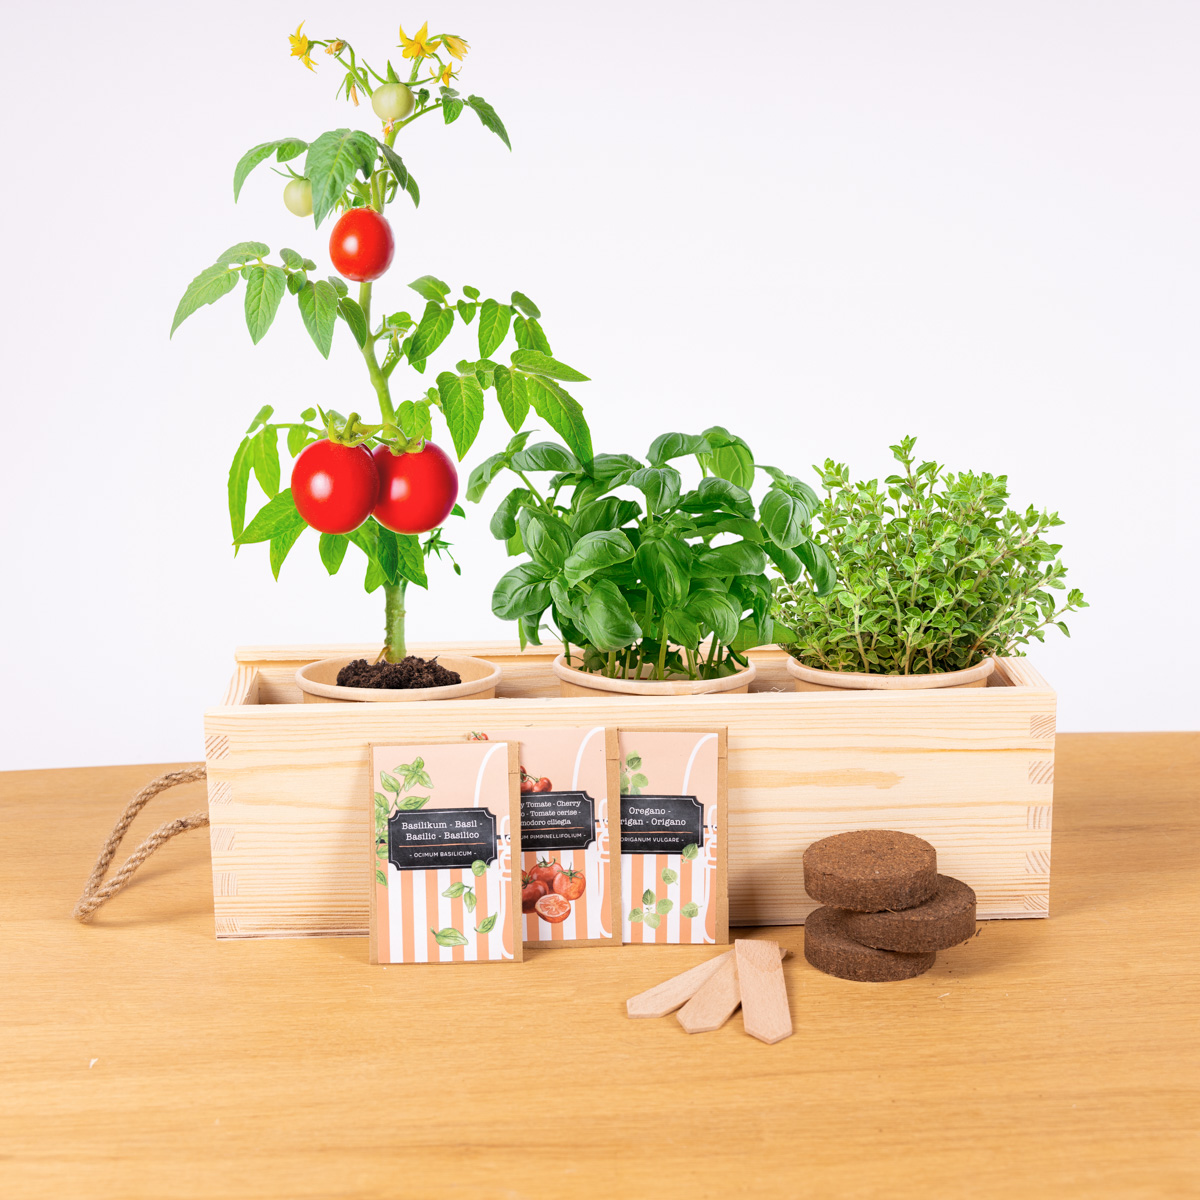 Mini Organische Moestuinen - Eco Garden